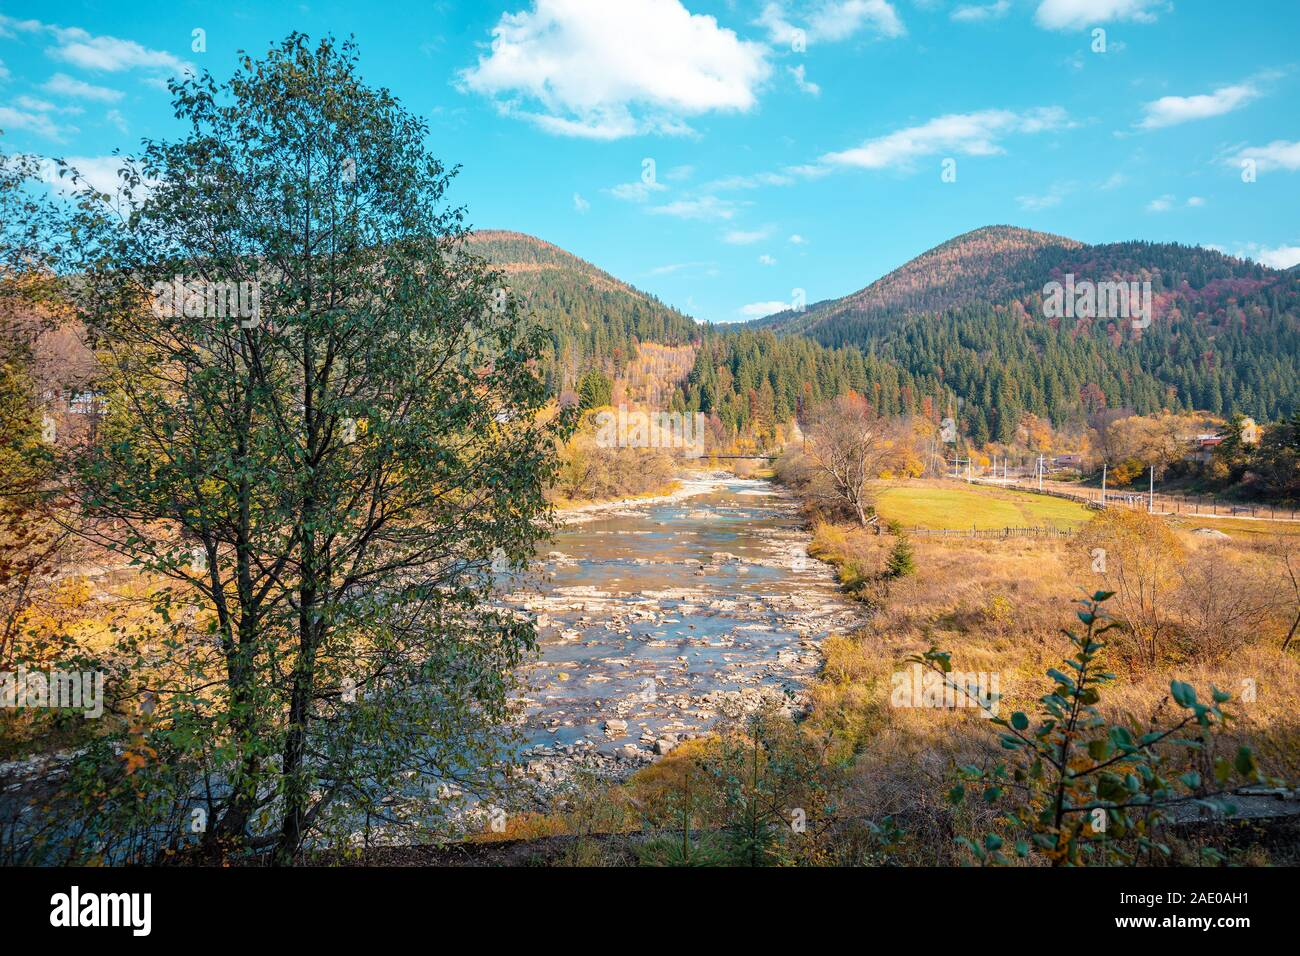 Mountain river on an autumn sunny day Stock Photo